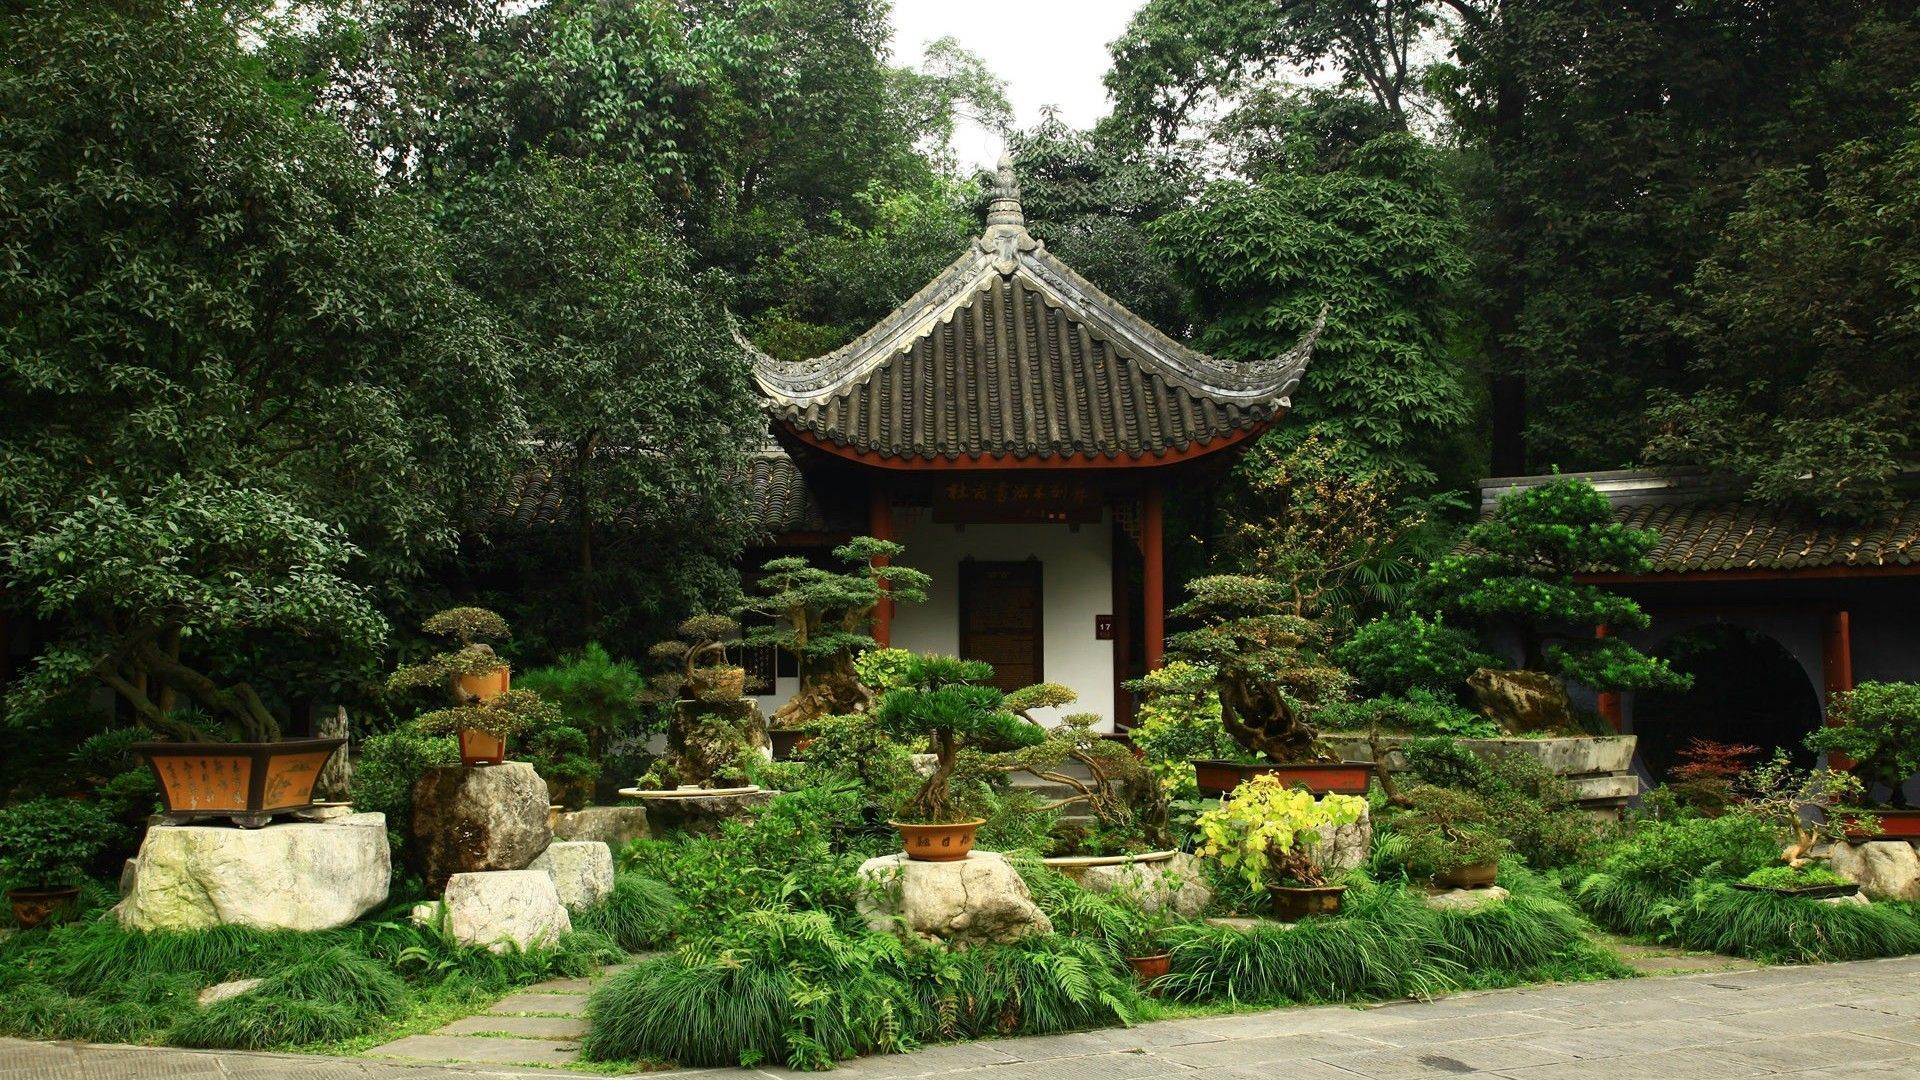 Japanese Bonsai Garden Bonsai Garden Japanese Bonsai Garden Japanese Bon Bonsai Garden Japanese J Bonsai Garden Garden Plant Pots Japanese Bonsai